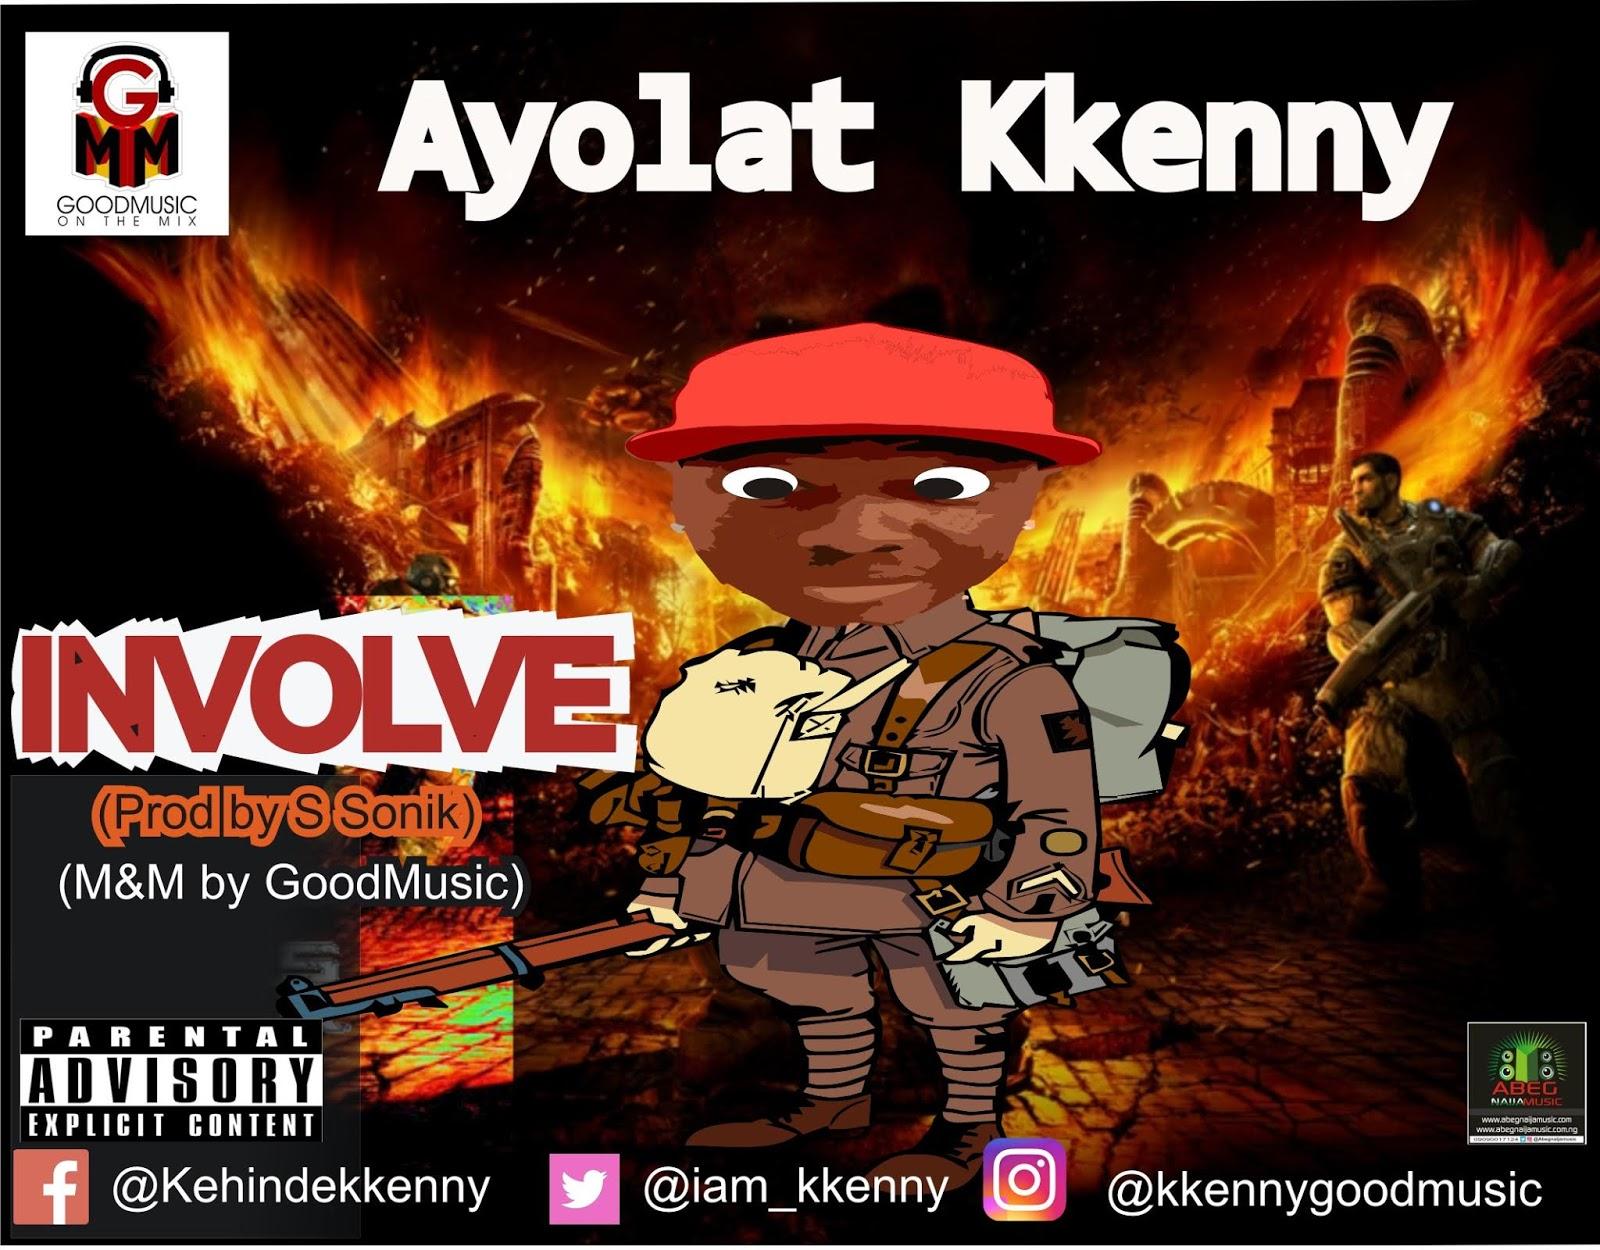 hit Music] Ayolat Kkenny - Involve  (mix Mastered By Goodmusic